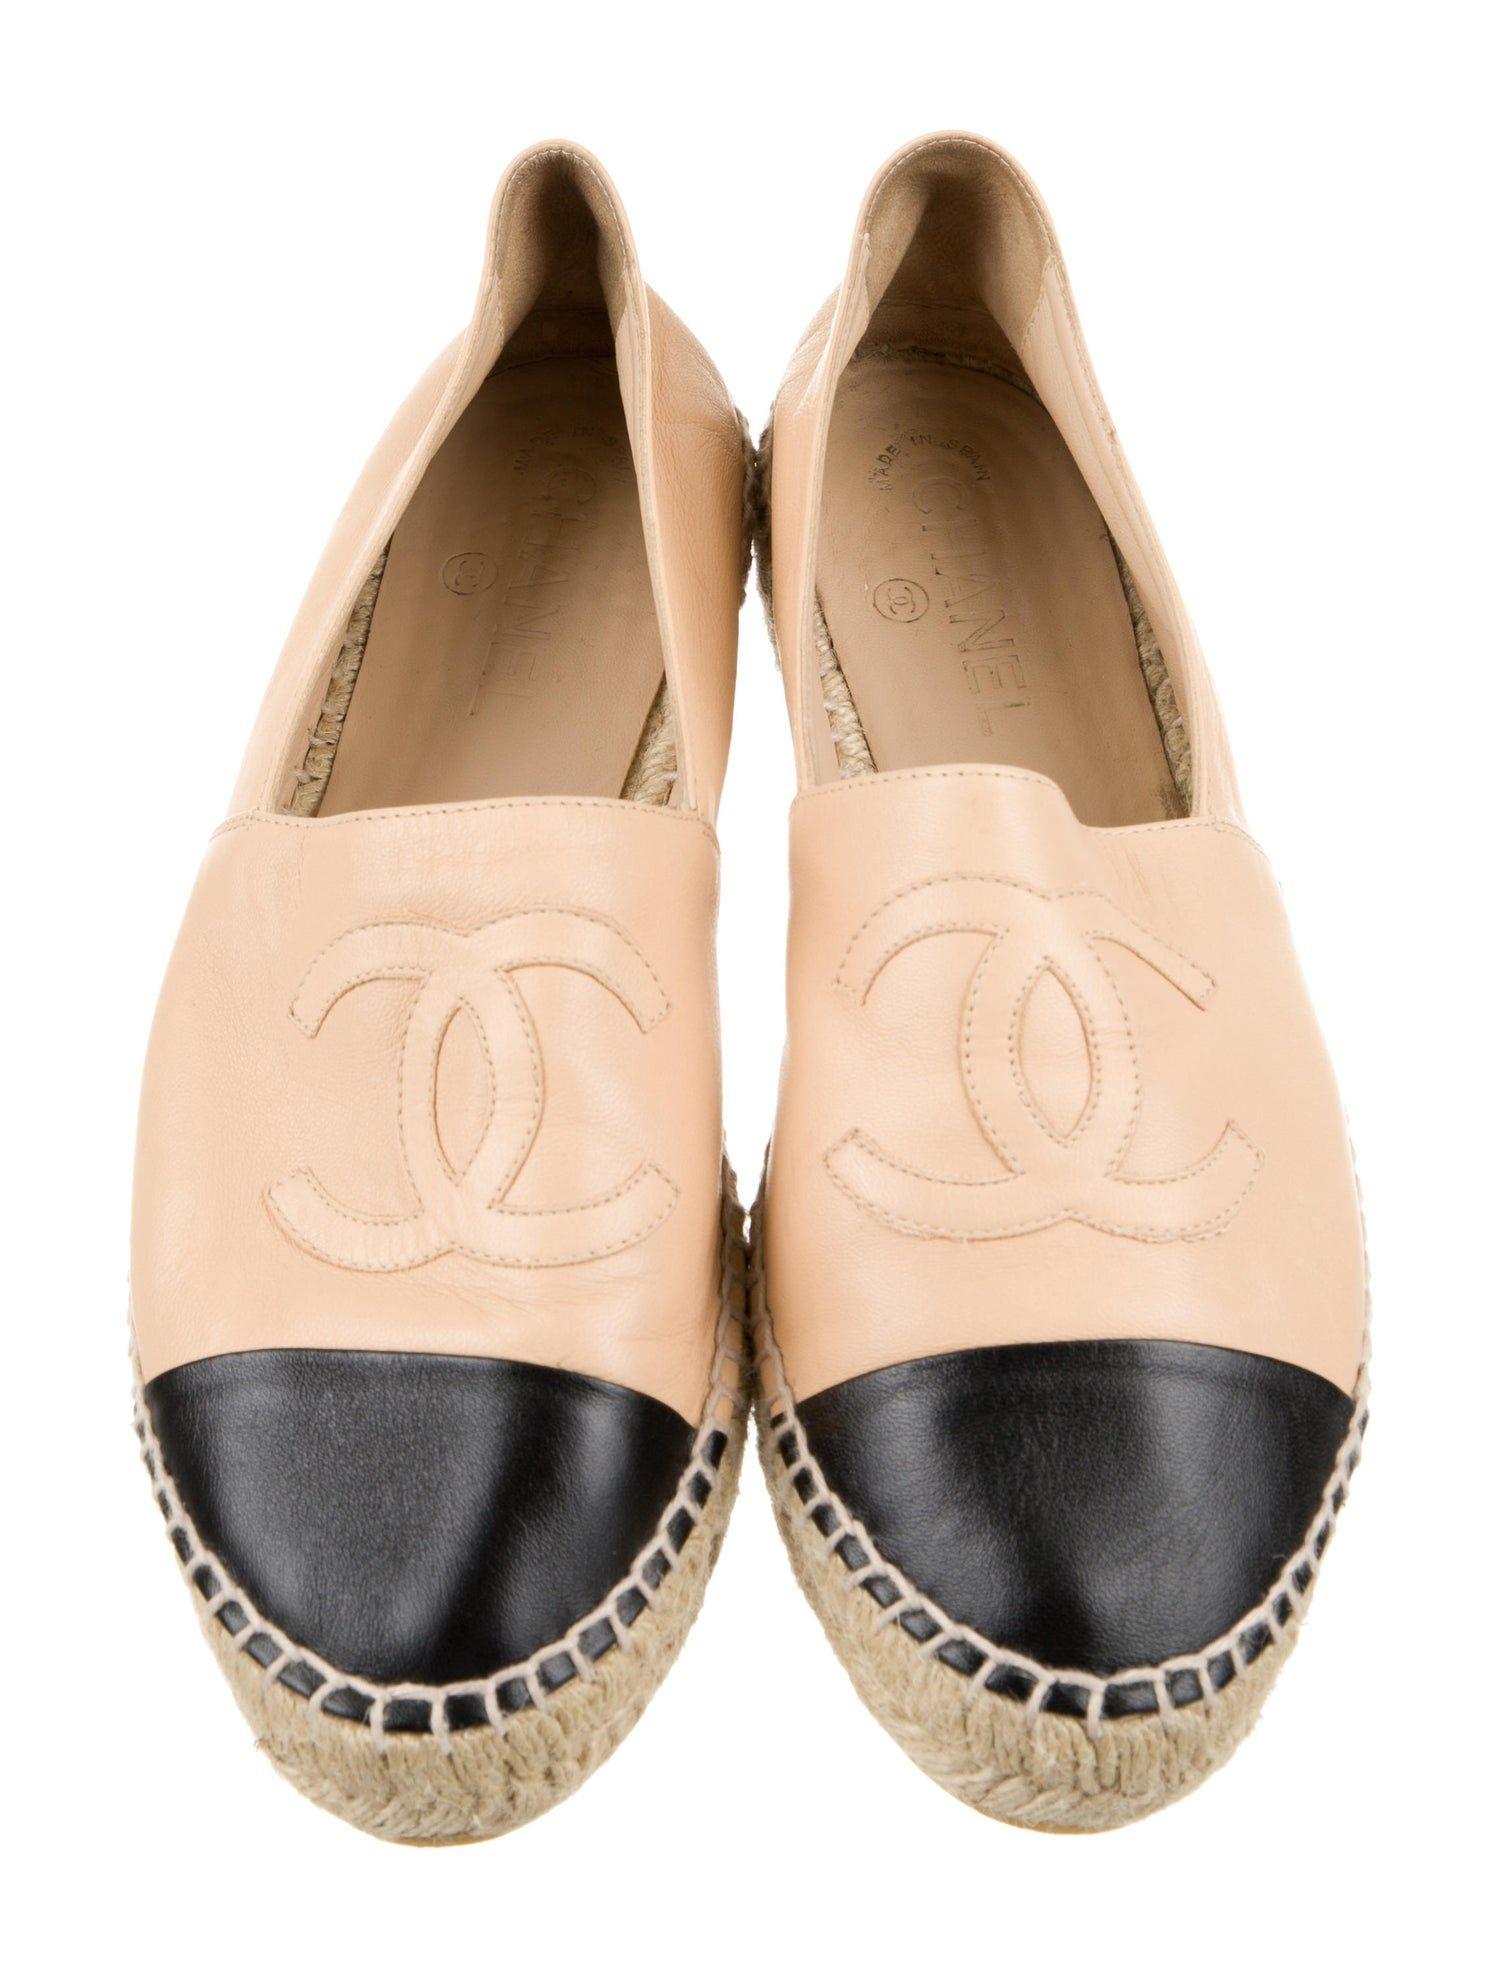 Chanel Lambskin CC Espadrilles